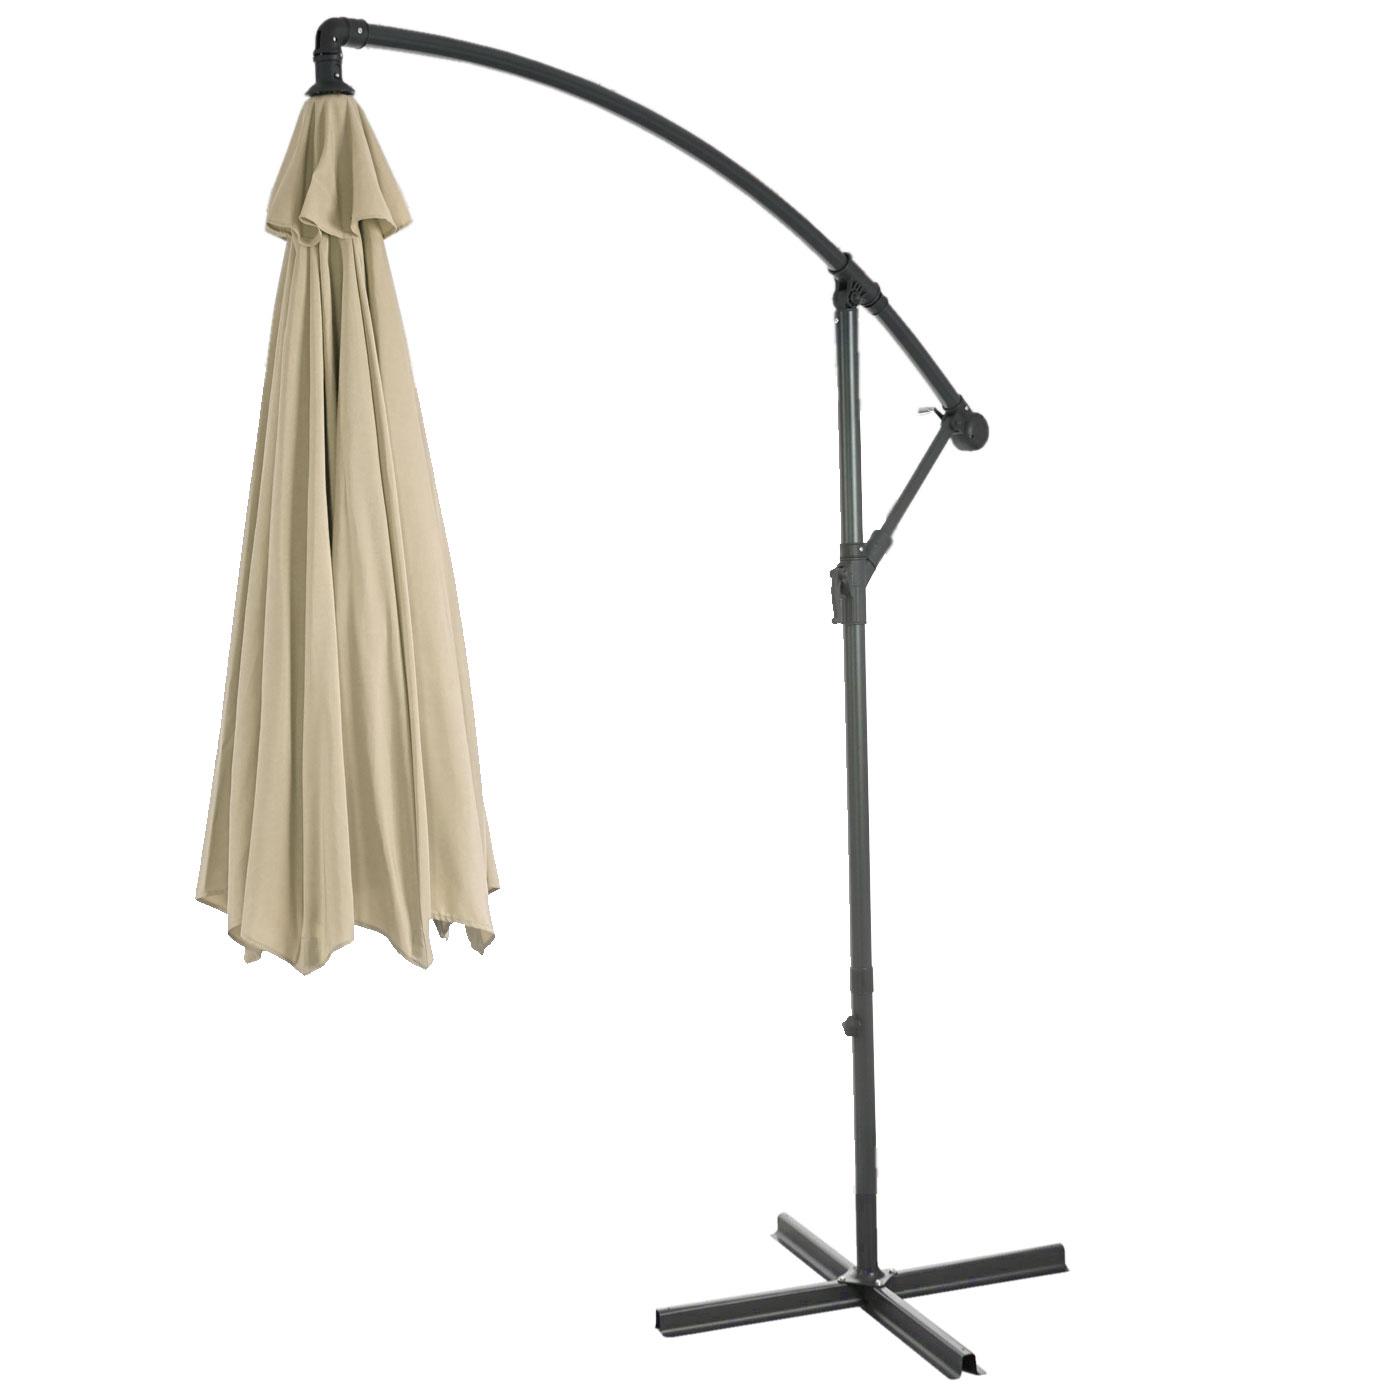 semi profi ampelschirm acerra sonnenschutz 3m neigbar creme ohne st nder. Black Bedroom Furniture Sets. Home Design Ideas